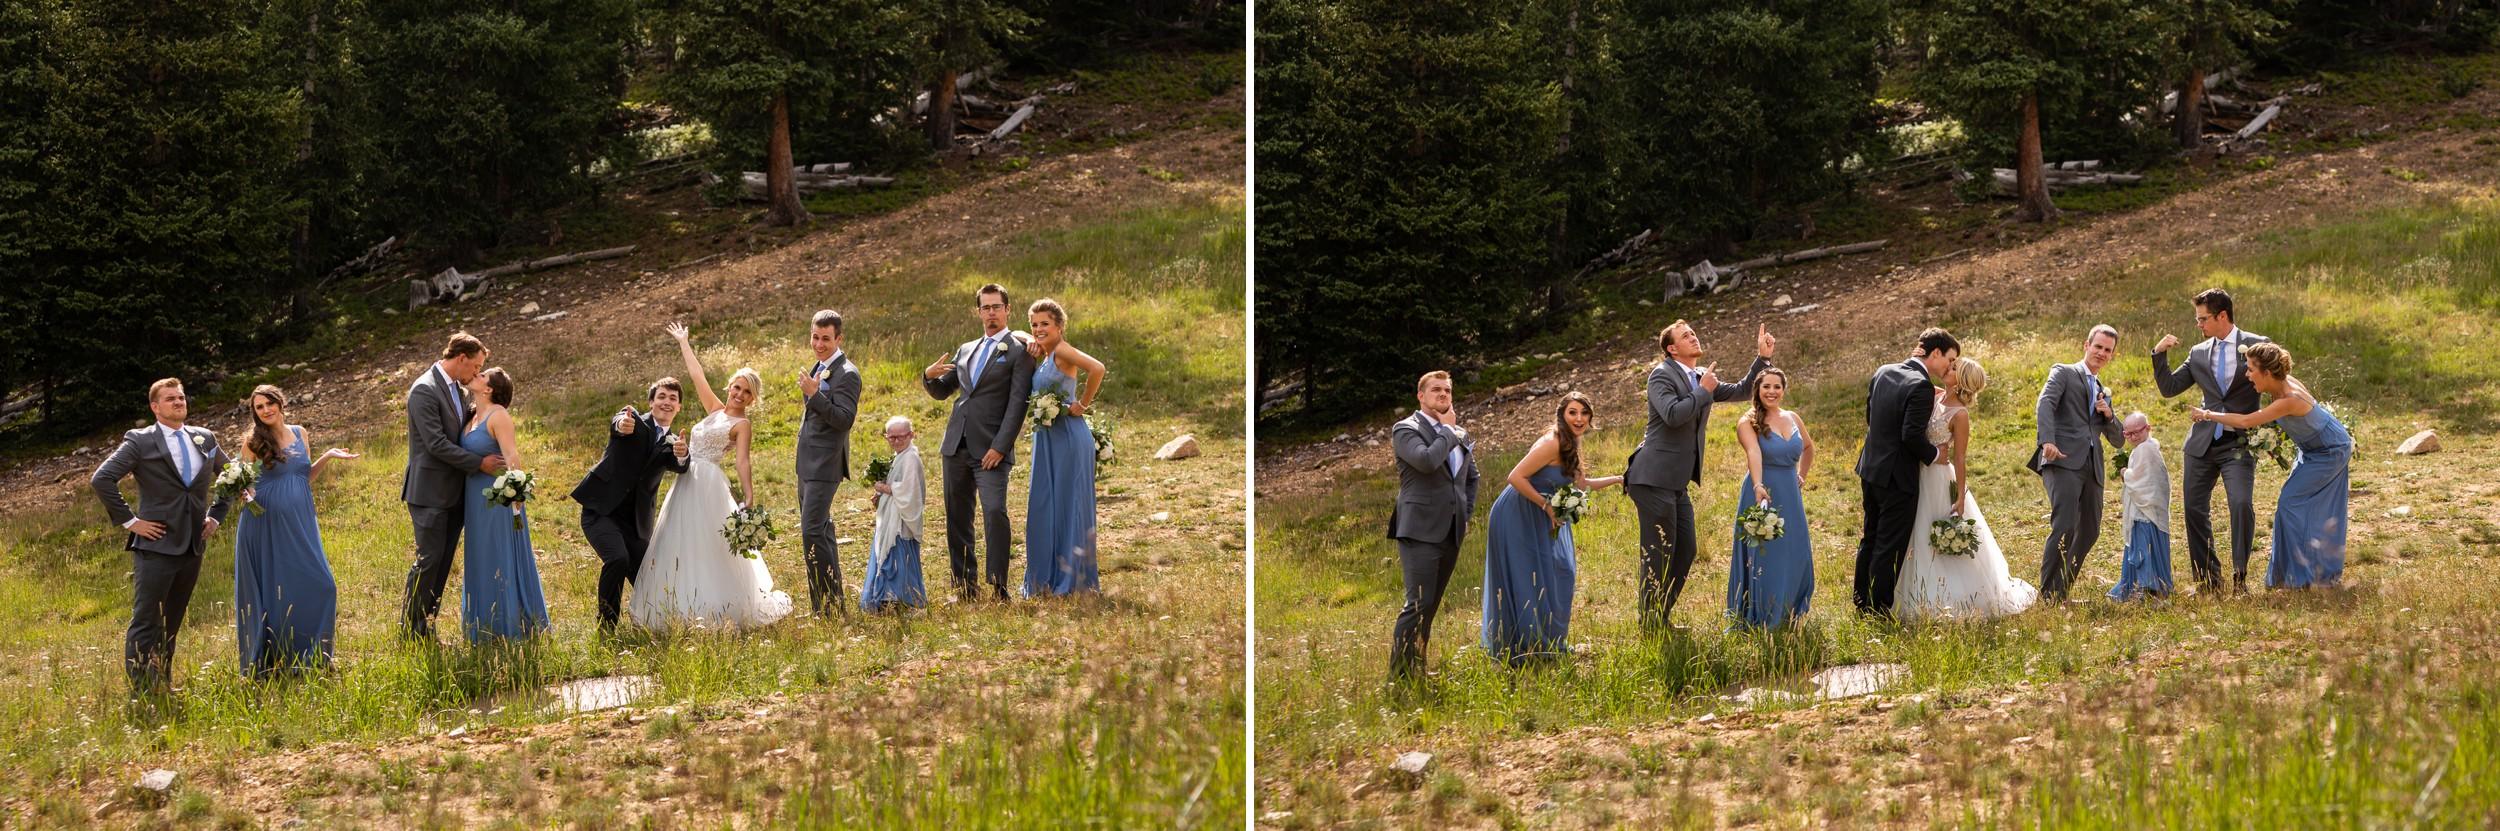 Keystone_Colorado_Mountain_Wedding 11.jpg